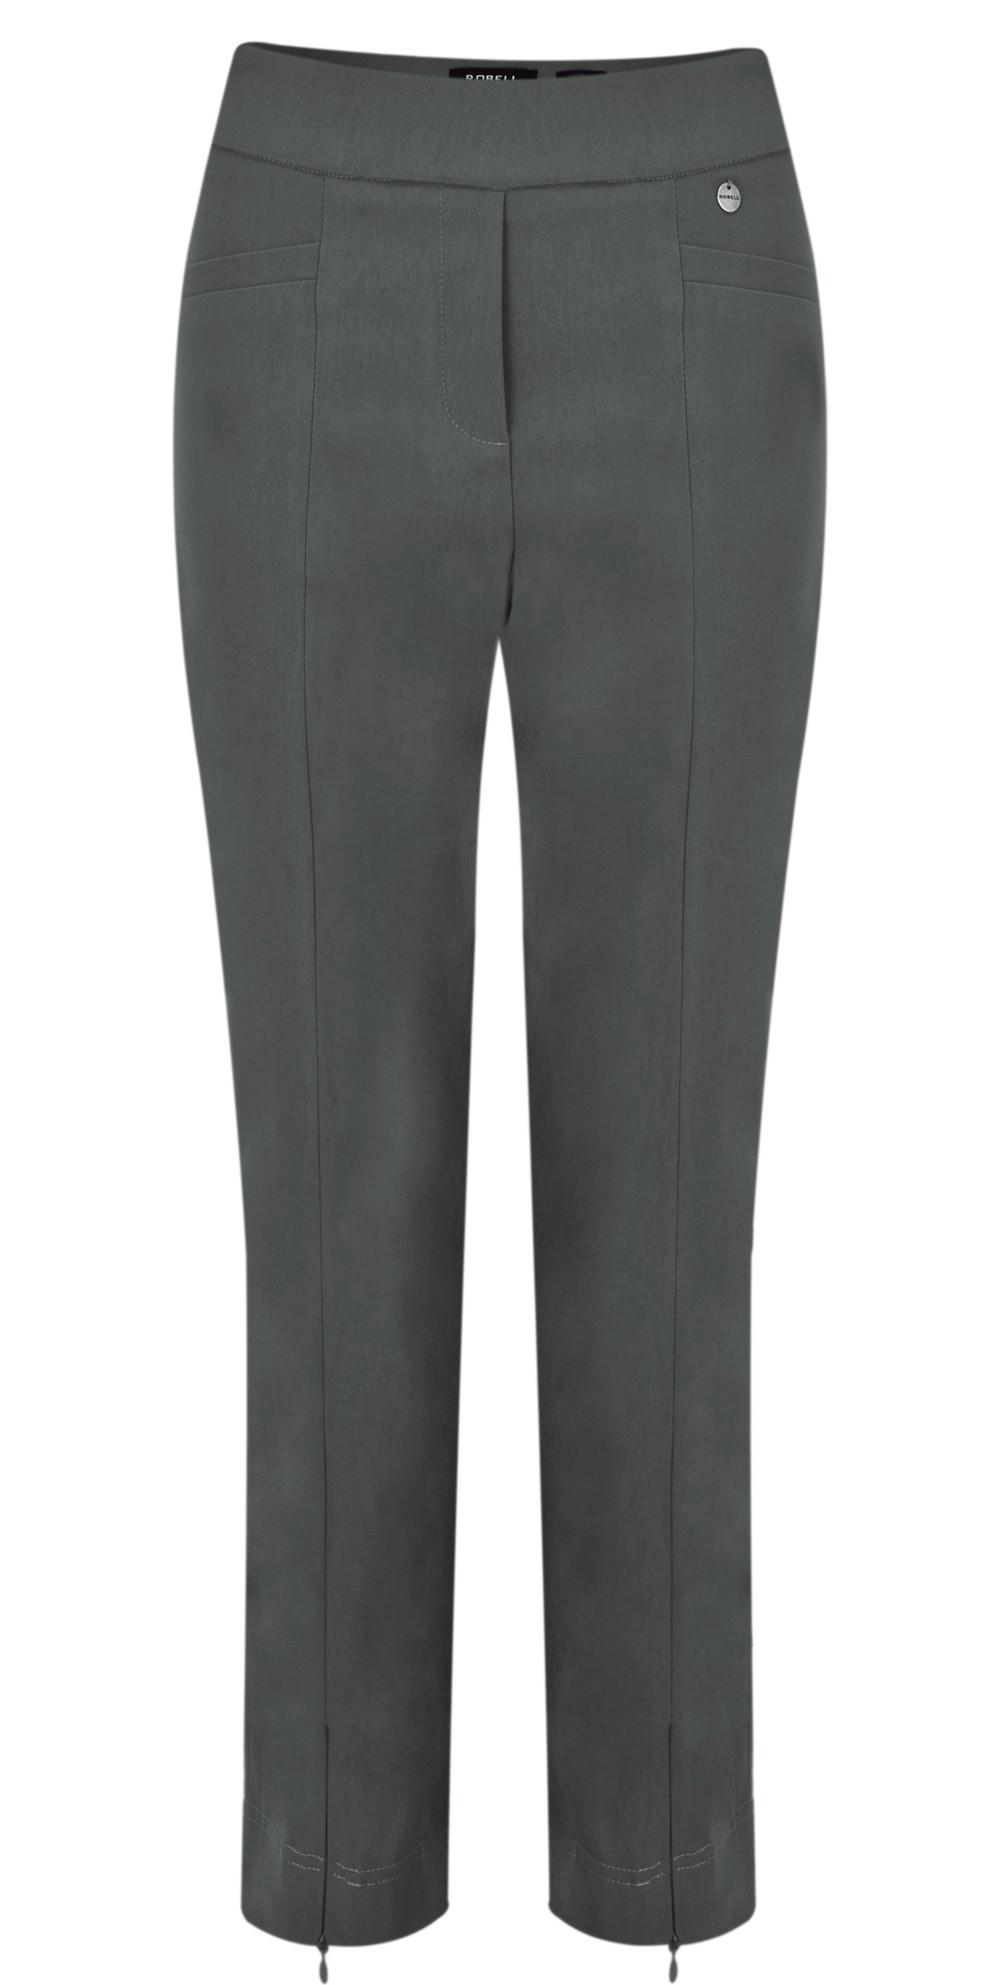 Nena 09 Grey Slimfit Fleece Lined Ankle Length Trouser main image